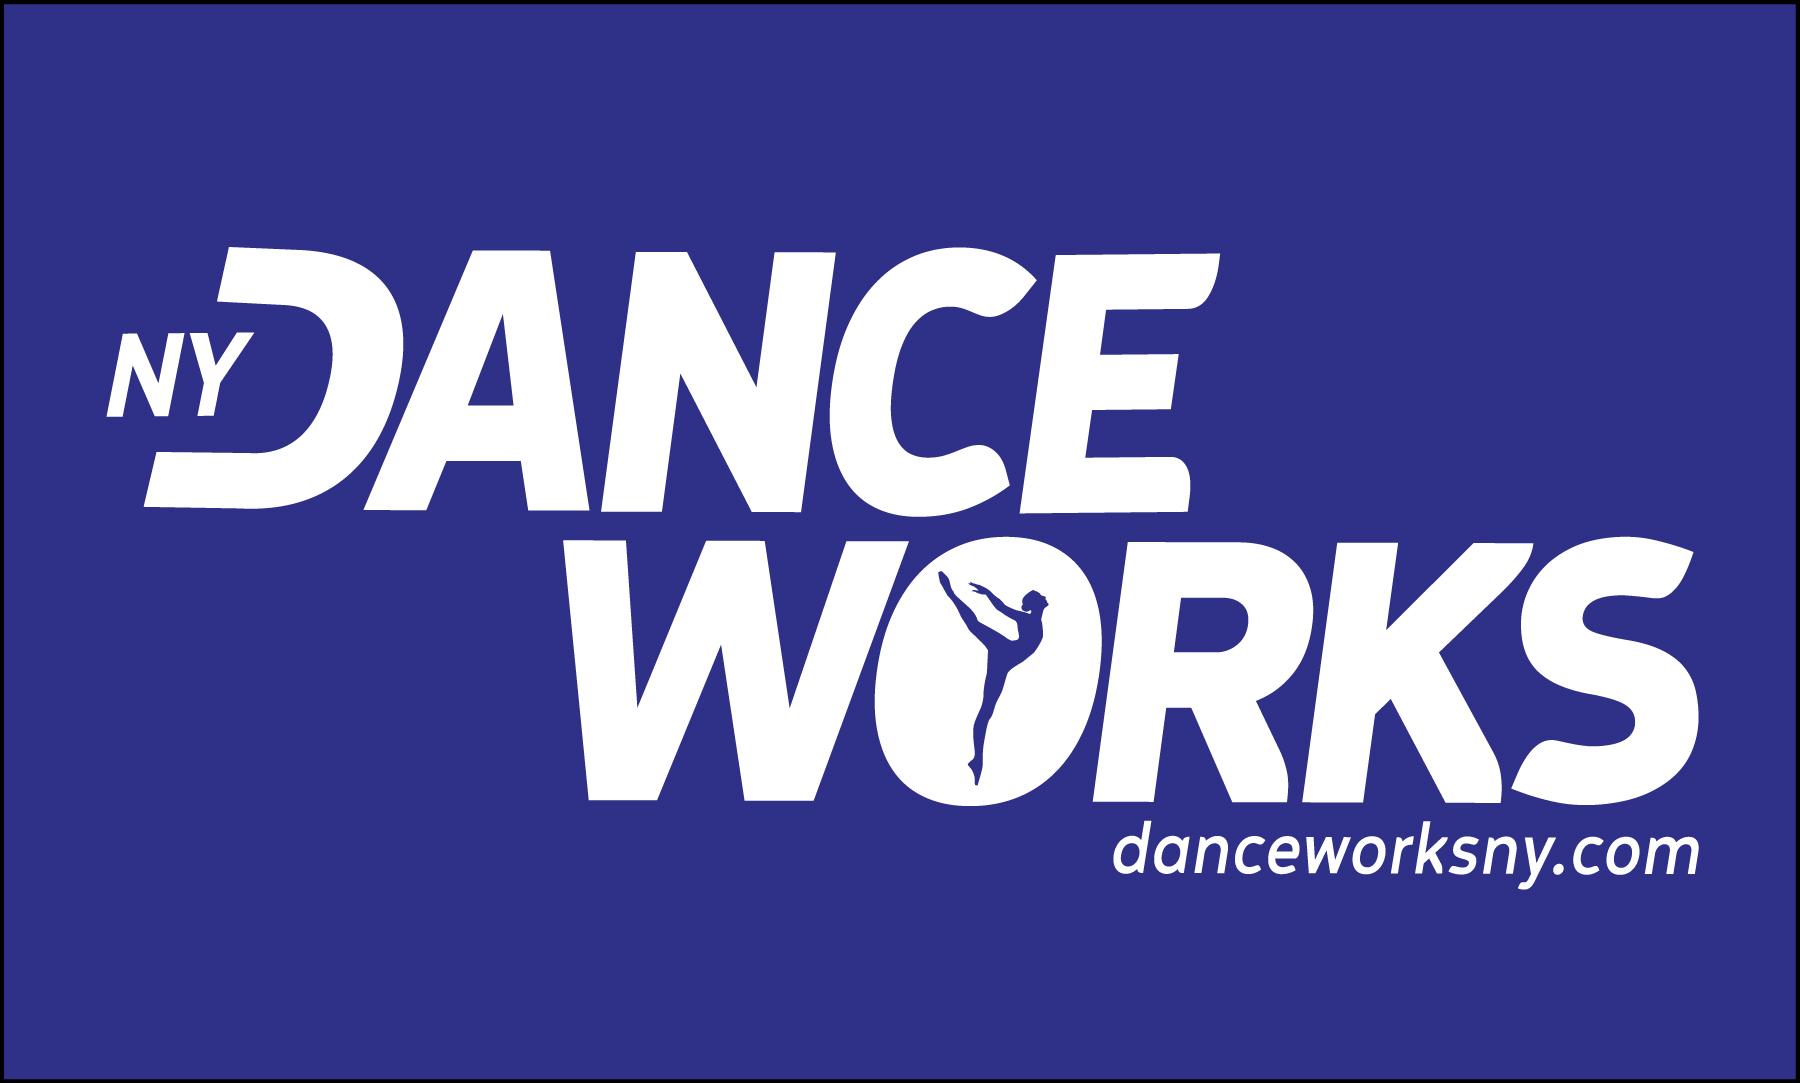 Danceworks NY